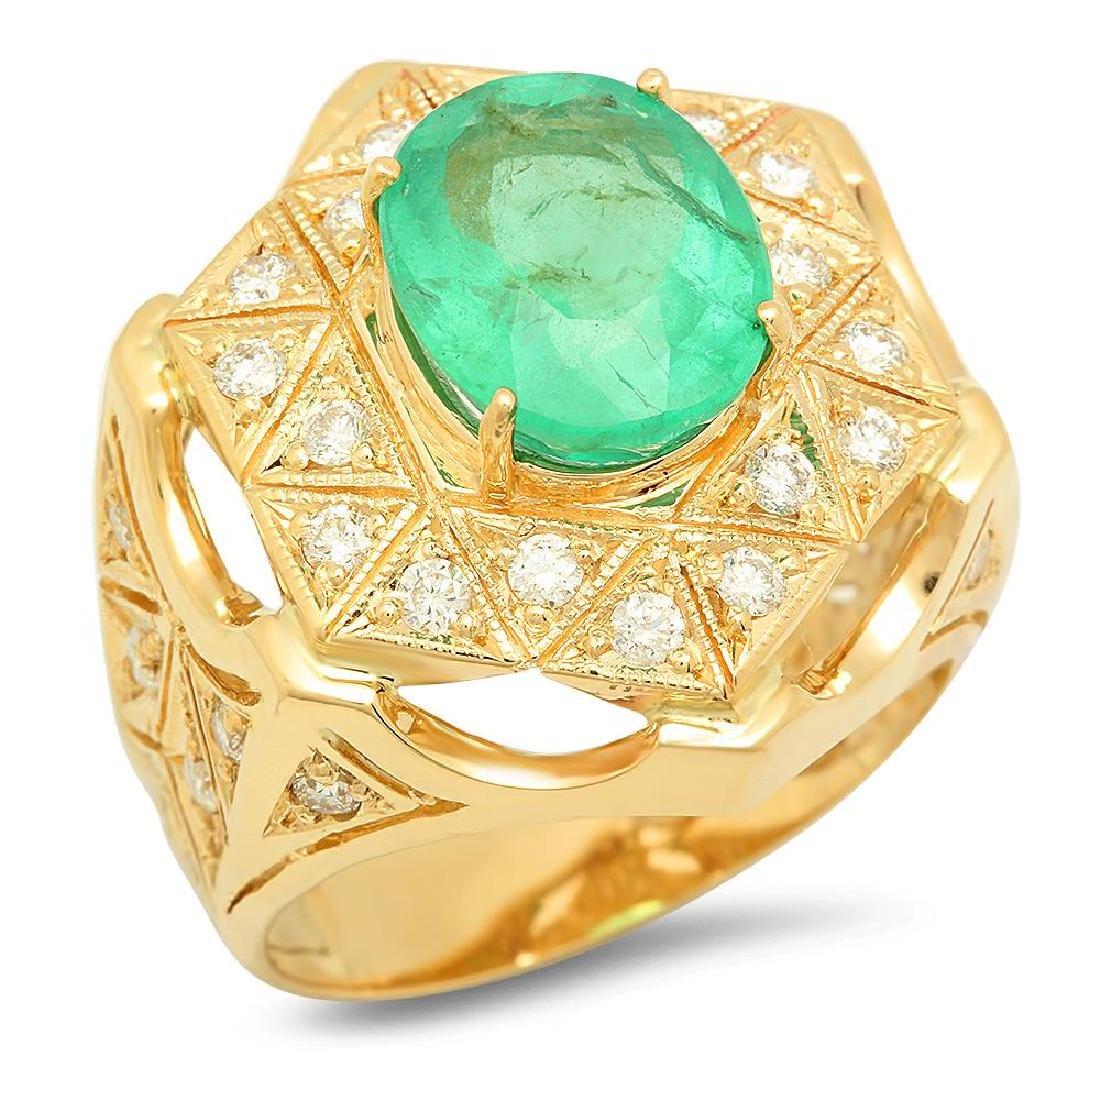 14K Gold 4.89ct Emerald 1.08cts Diamond Ring